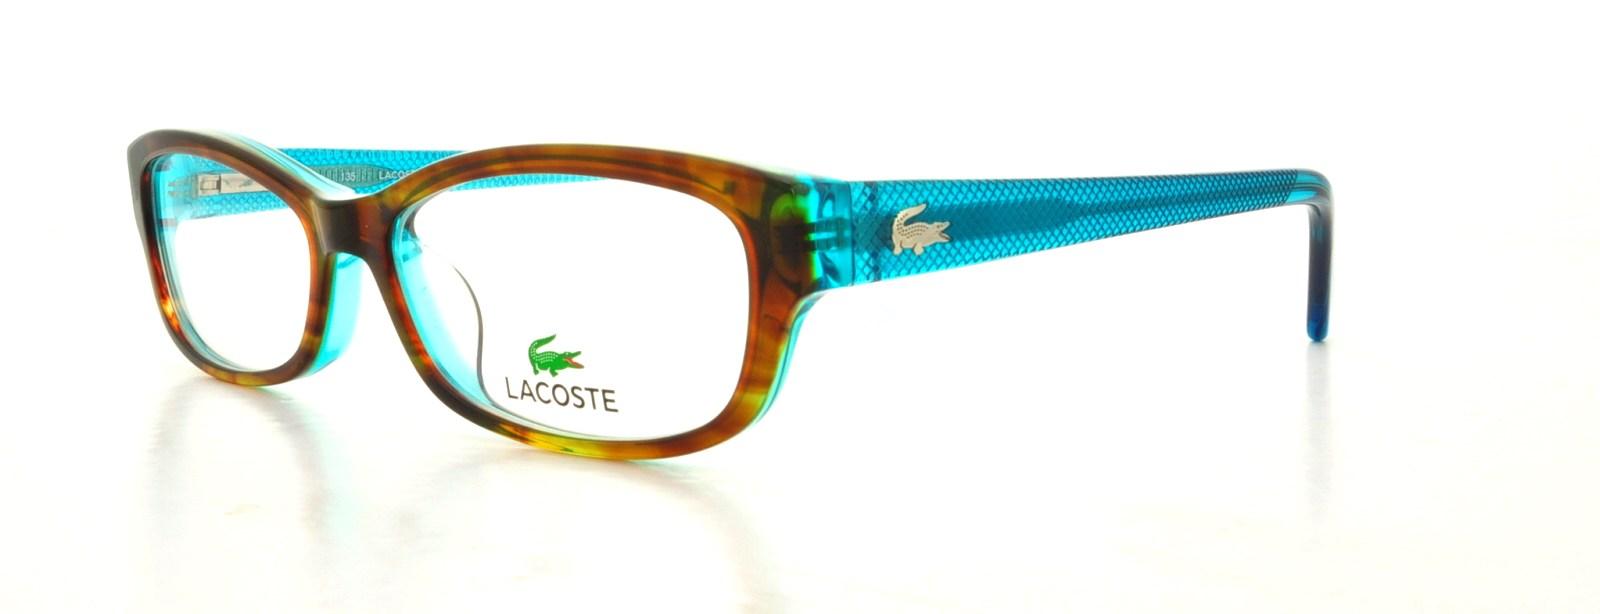 20e1bac40b3e Designer Frames Outlet. Lacoste L2673